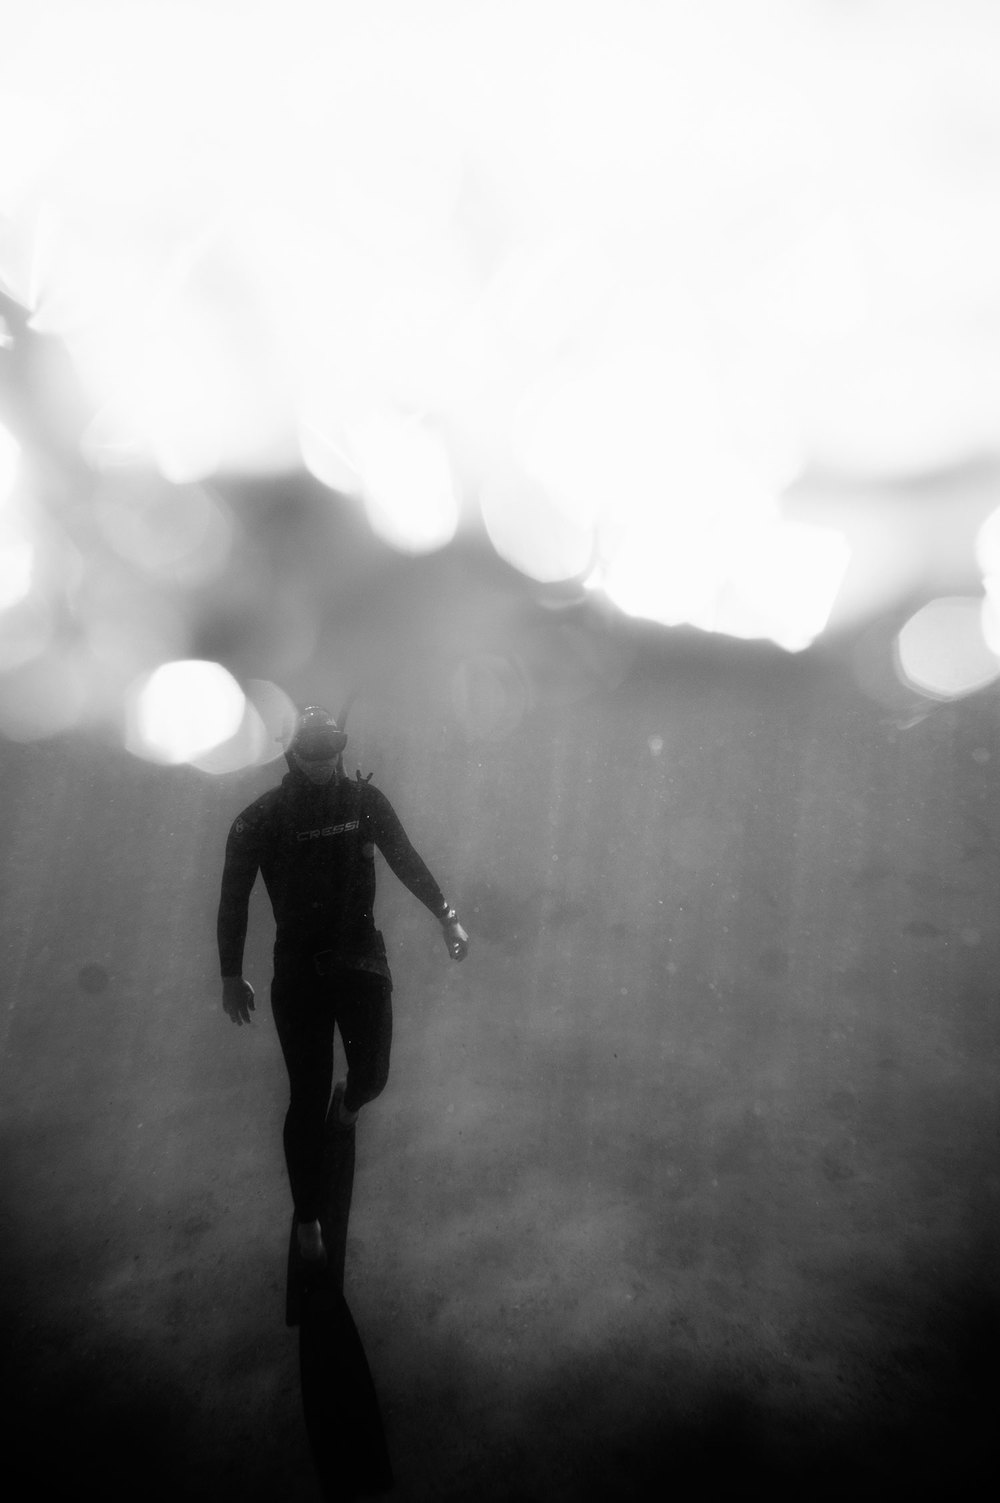 victor-caringal-sydney-freediving-05.JPG